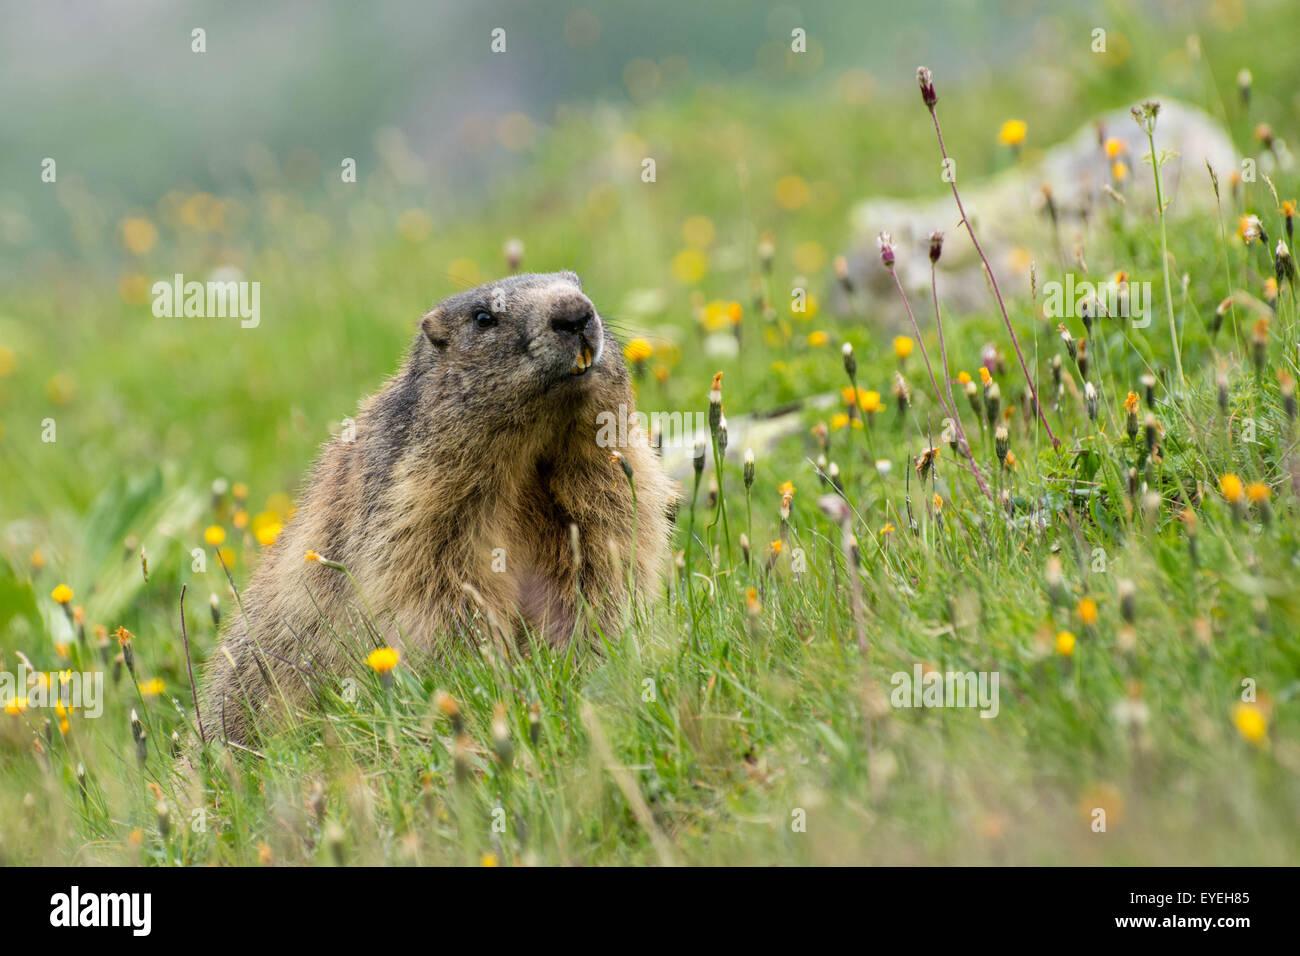 An Alpine Marmot (Marmota marmota) in a field of alpine flowers in the Austrian Alps. - Stock Image